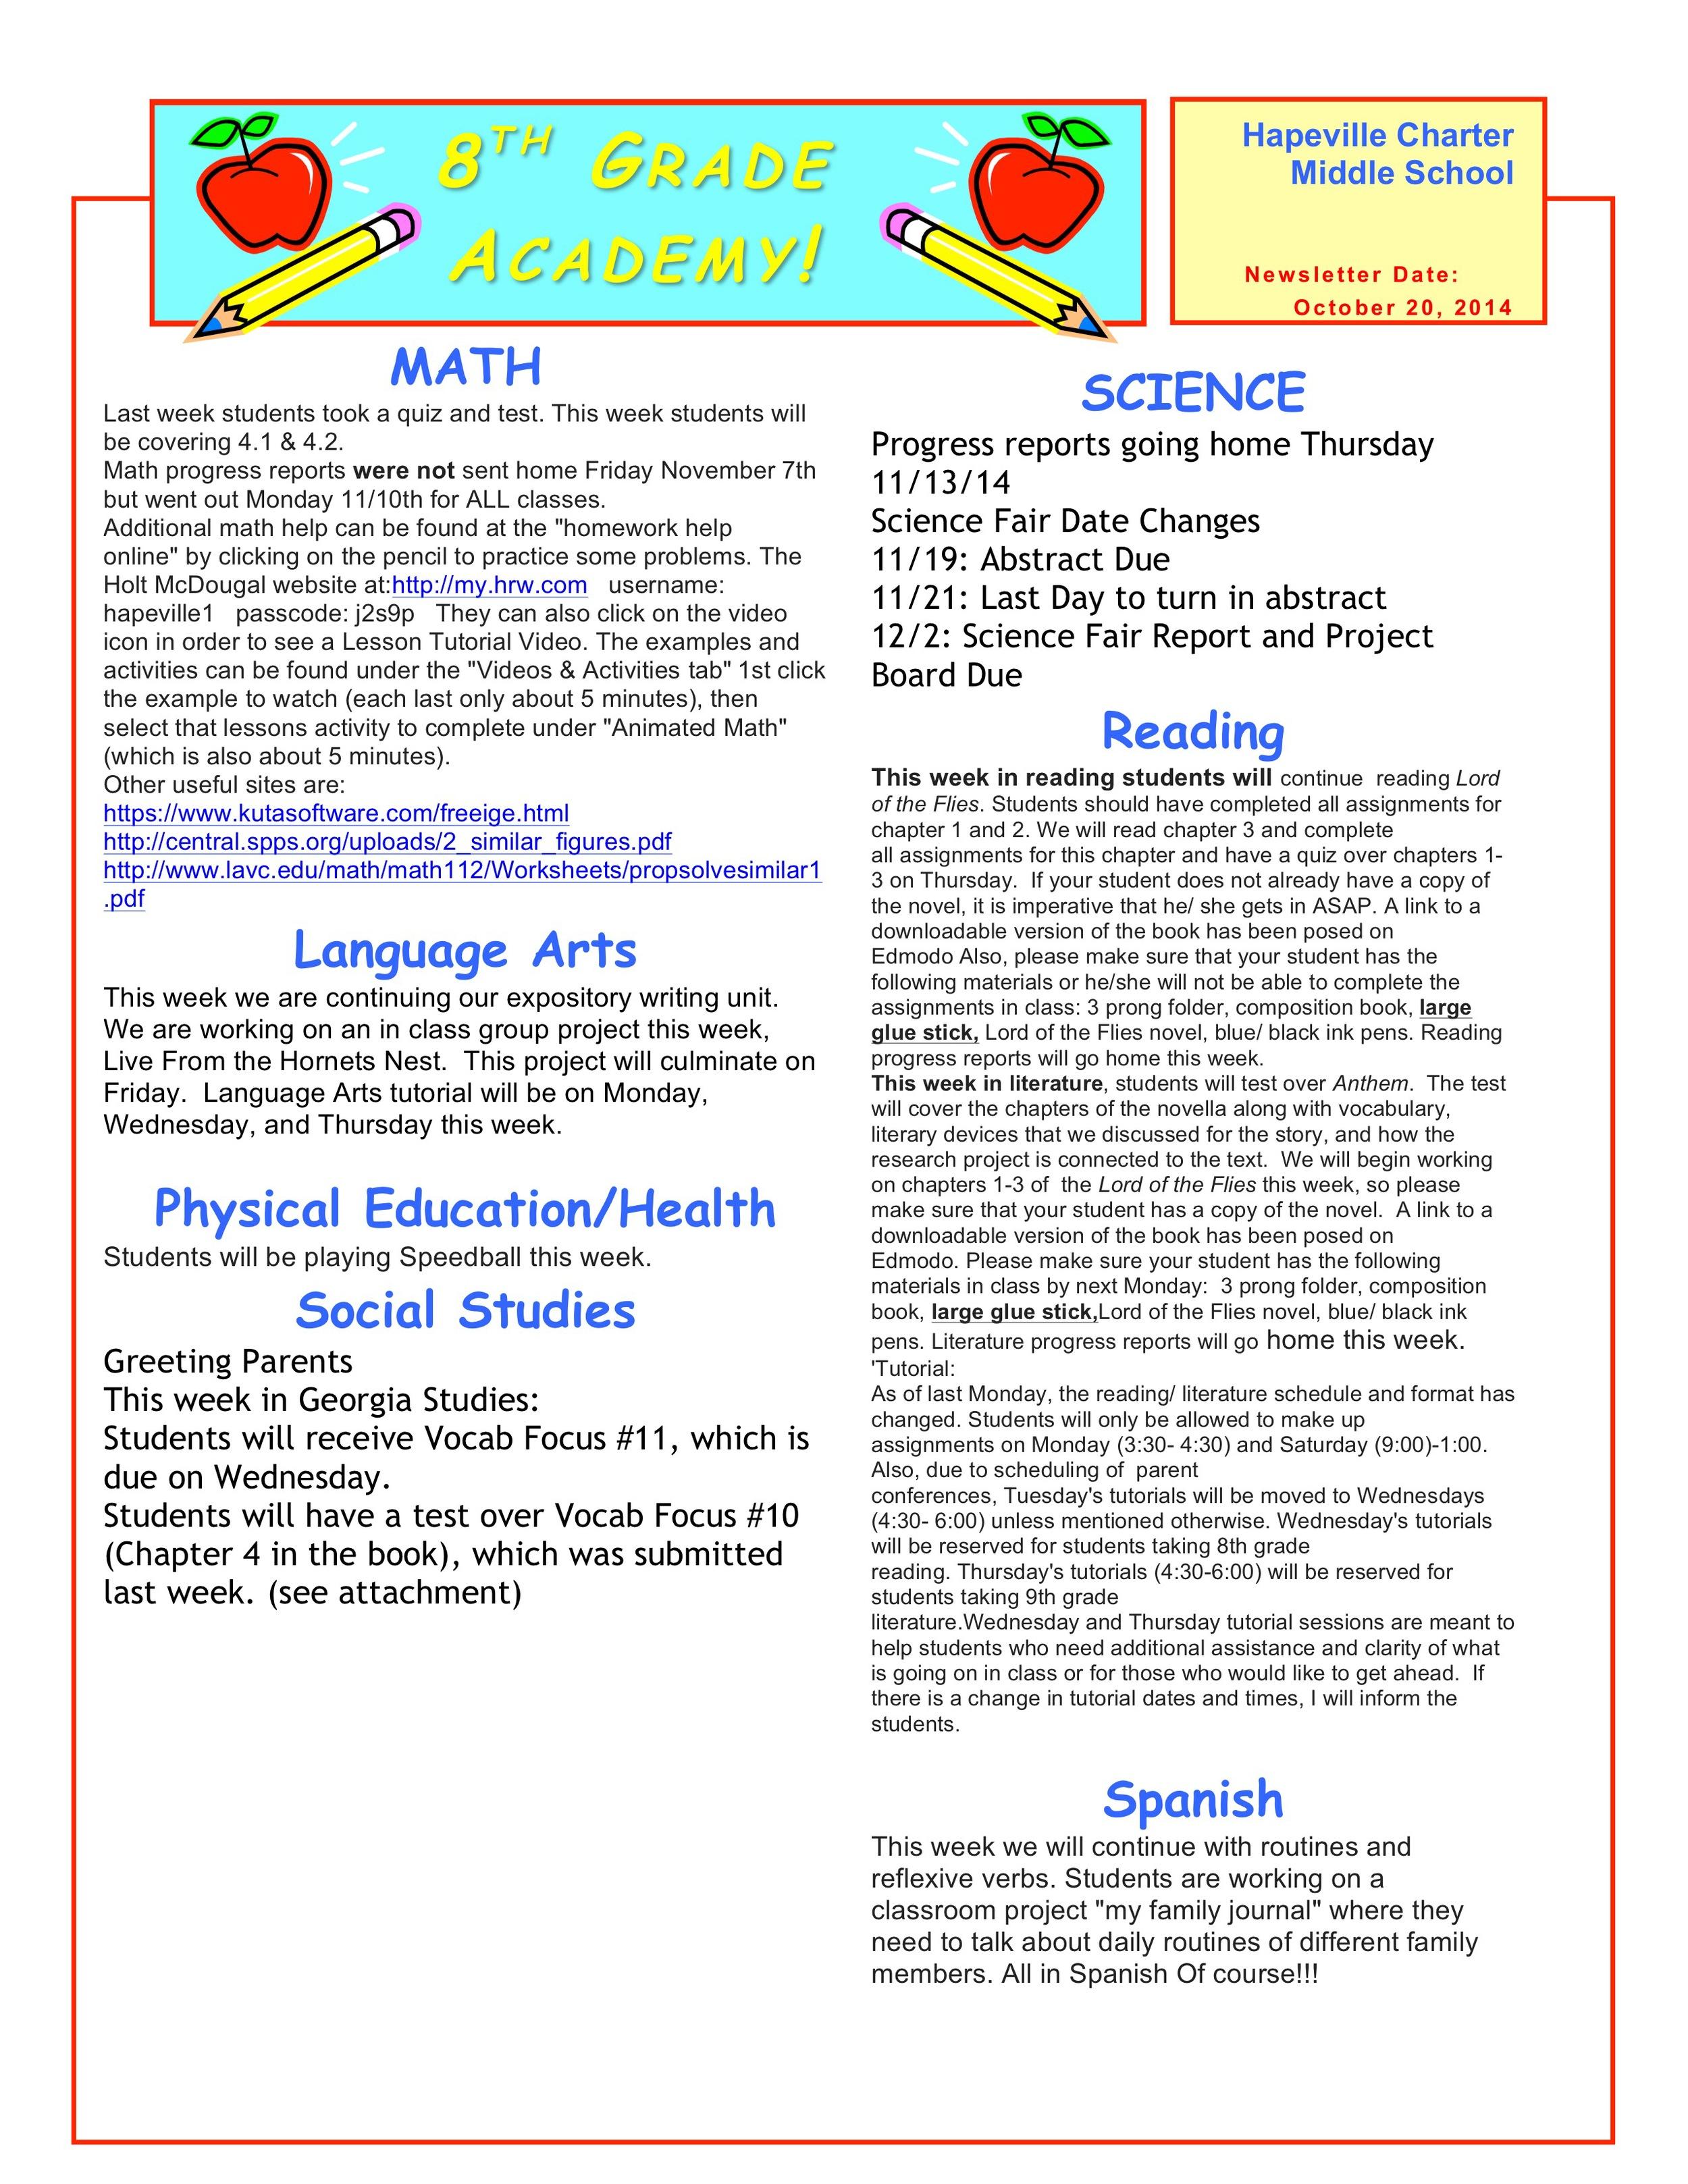 Newsletter Image8th grade nov 10-14.jpeg